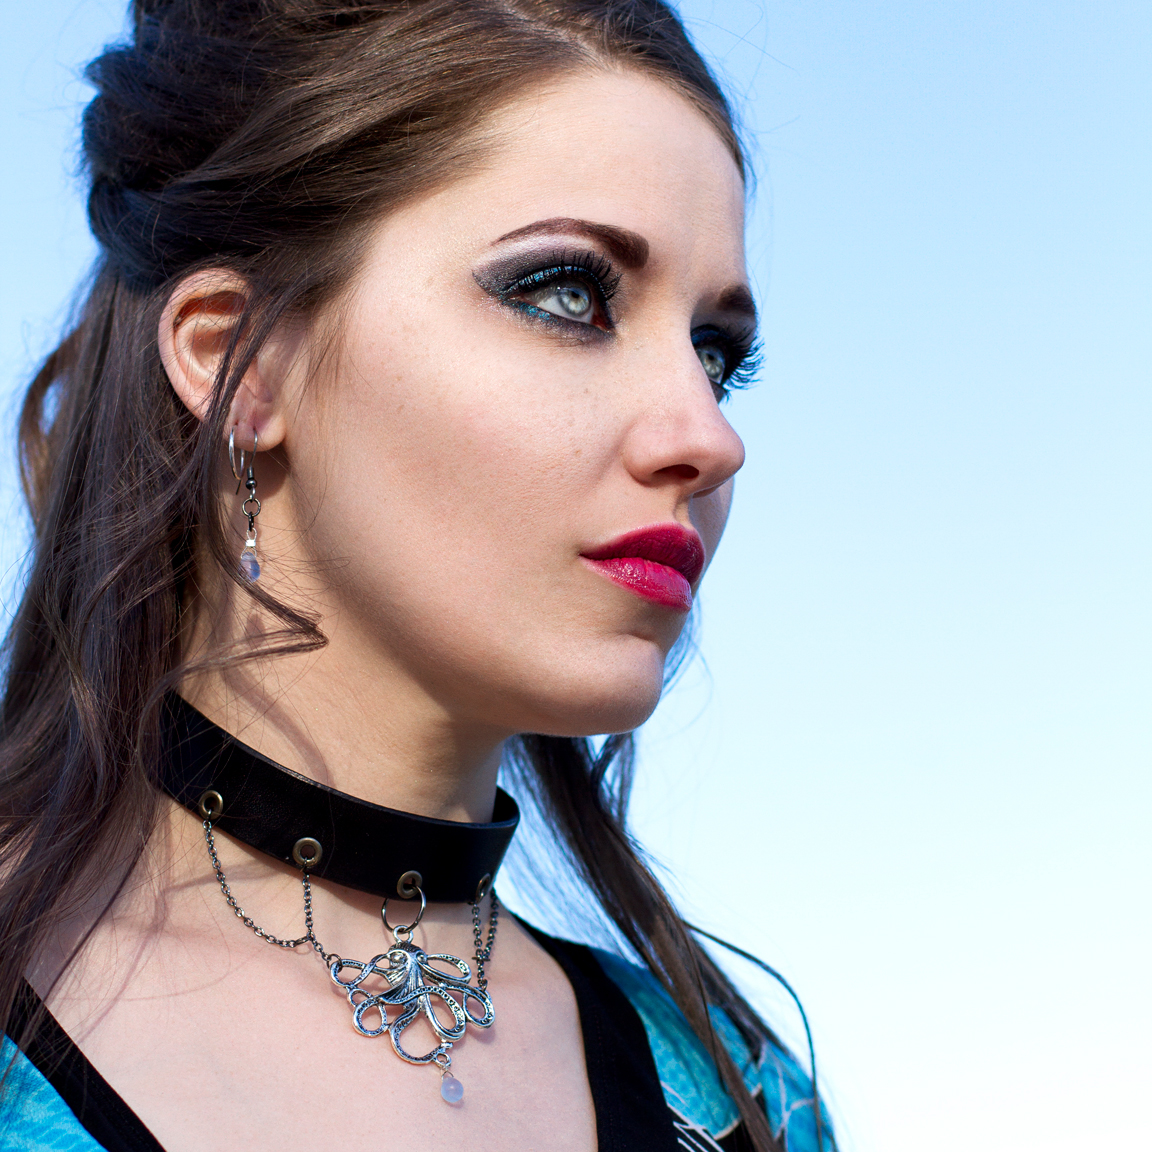 octopus-choker-necklace